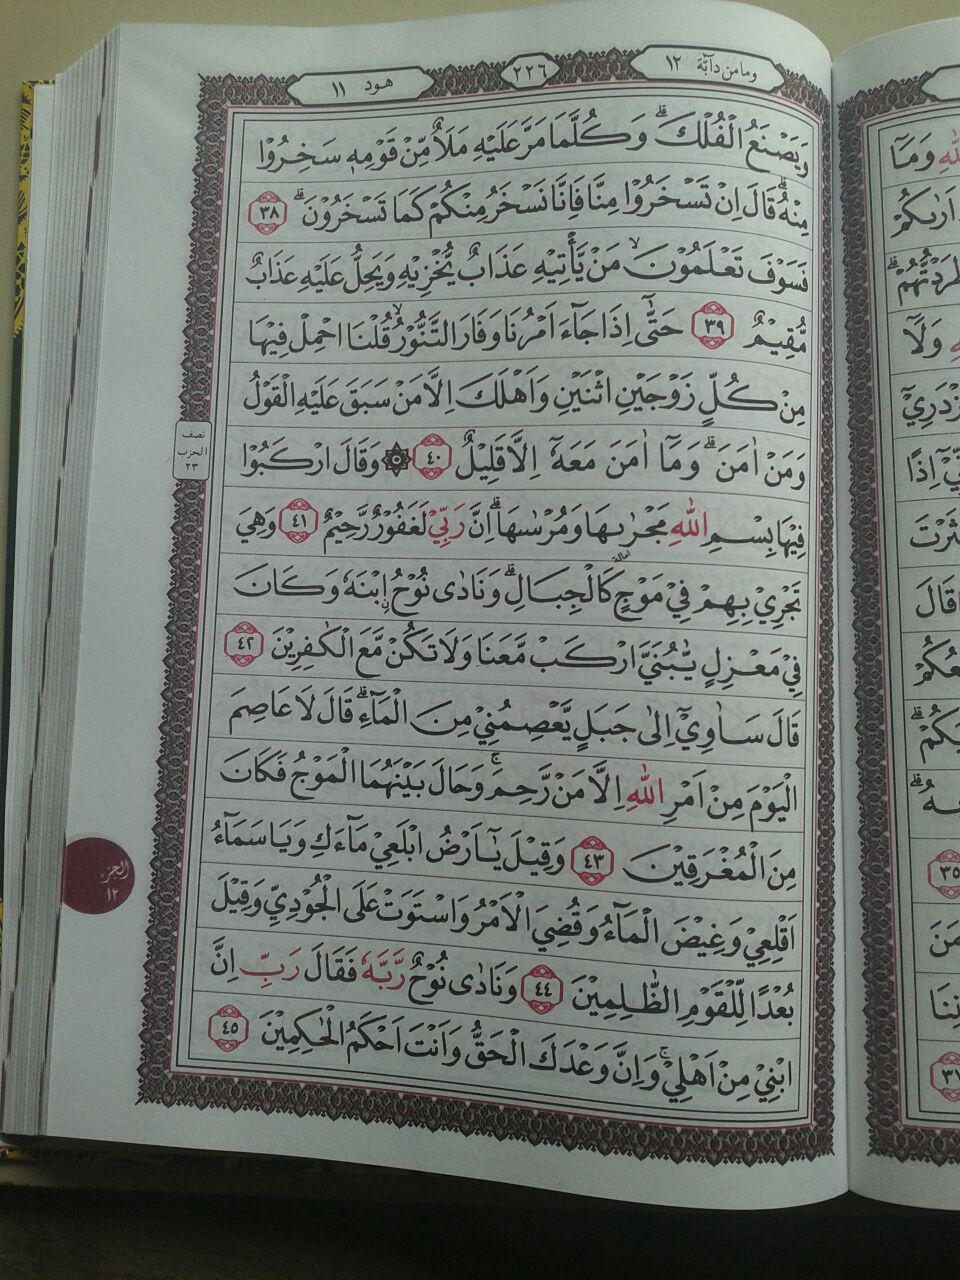 Al-Qur'an Mushaf Samsia 15 Baris Khot Utsmani Ukuran A4 isi